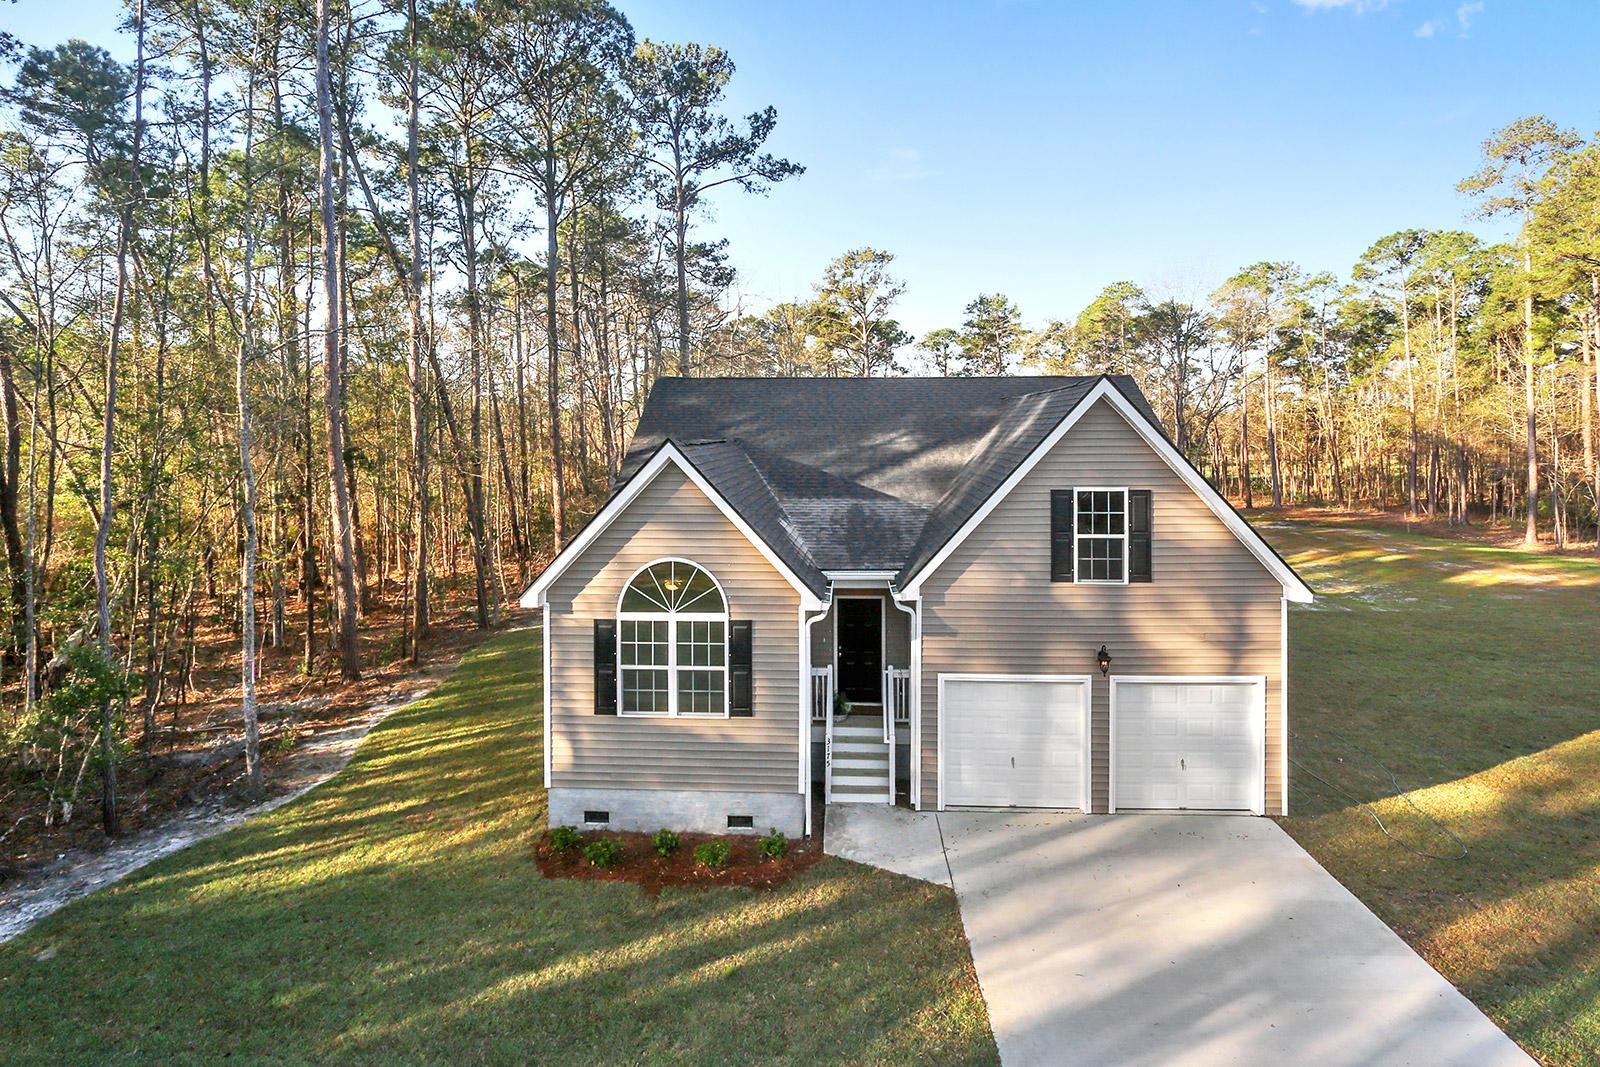 Britton Homes For Sale - 3175 Edenvale, Johns Island, SC - 0